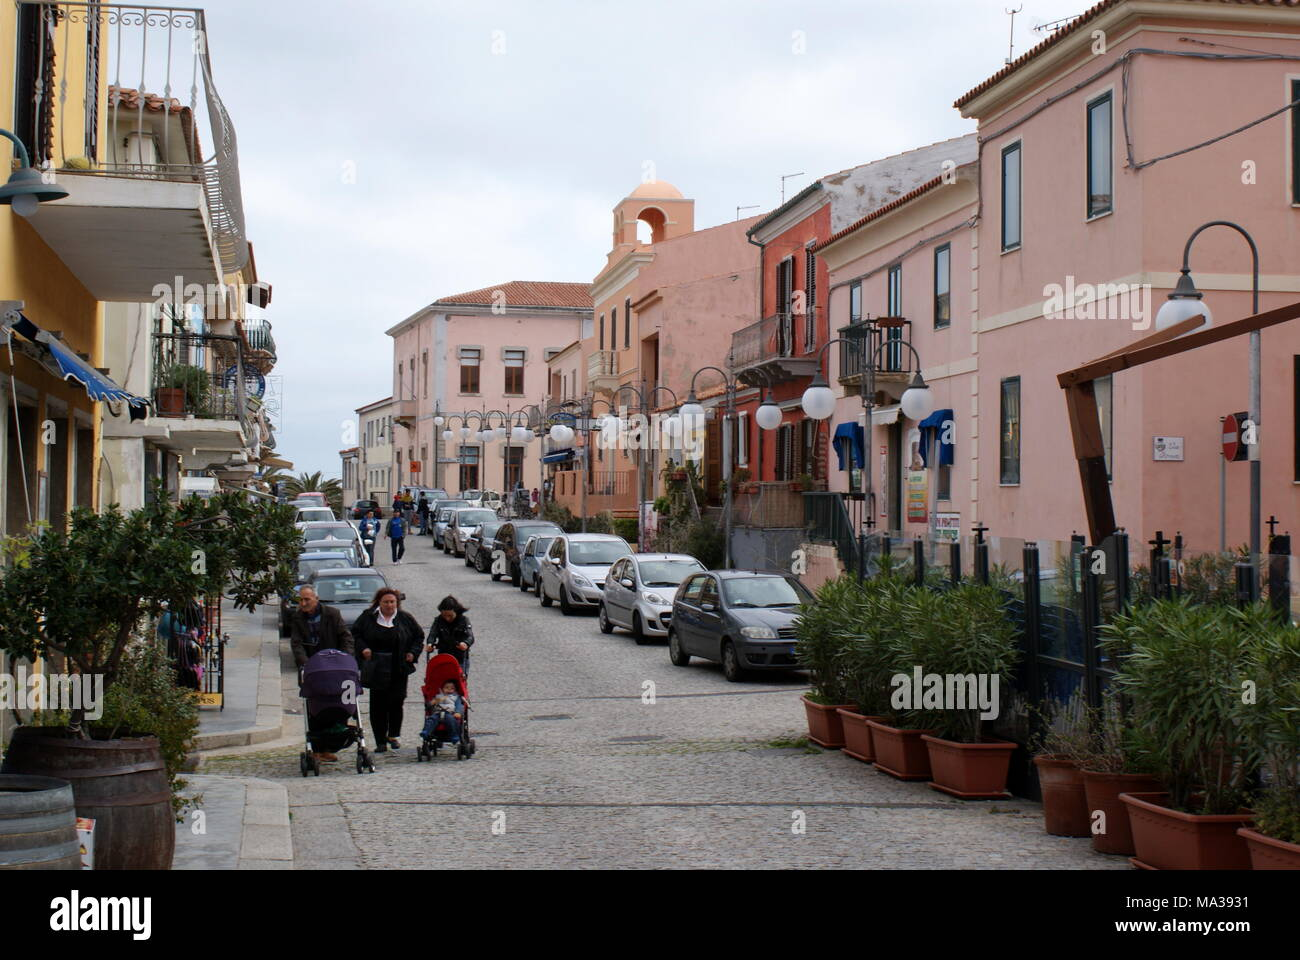 Street view, Santa Teresa Gallura, Sardinia, Italy Stock Photo